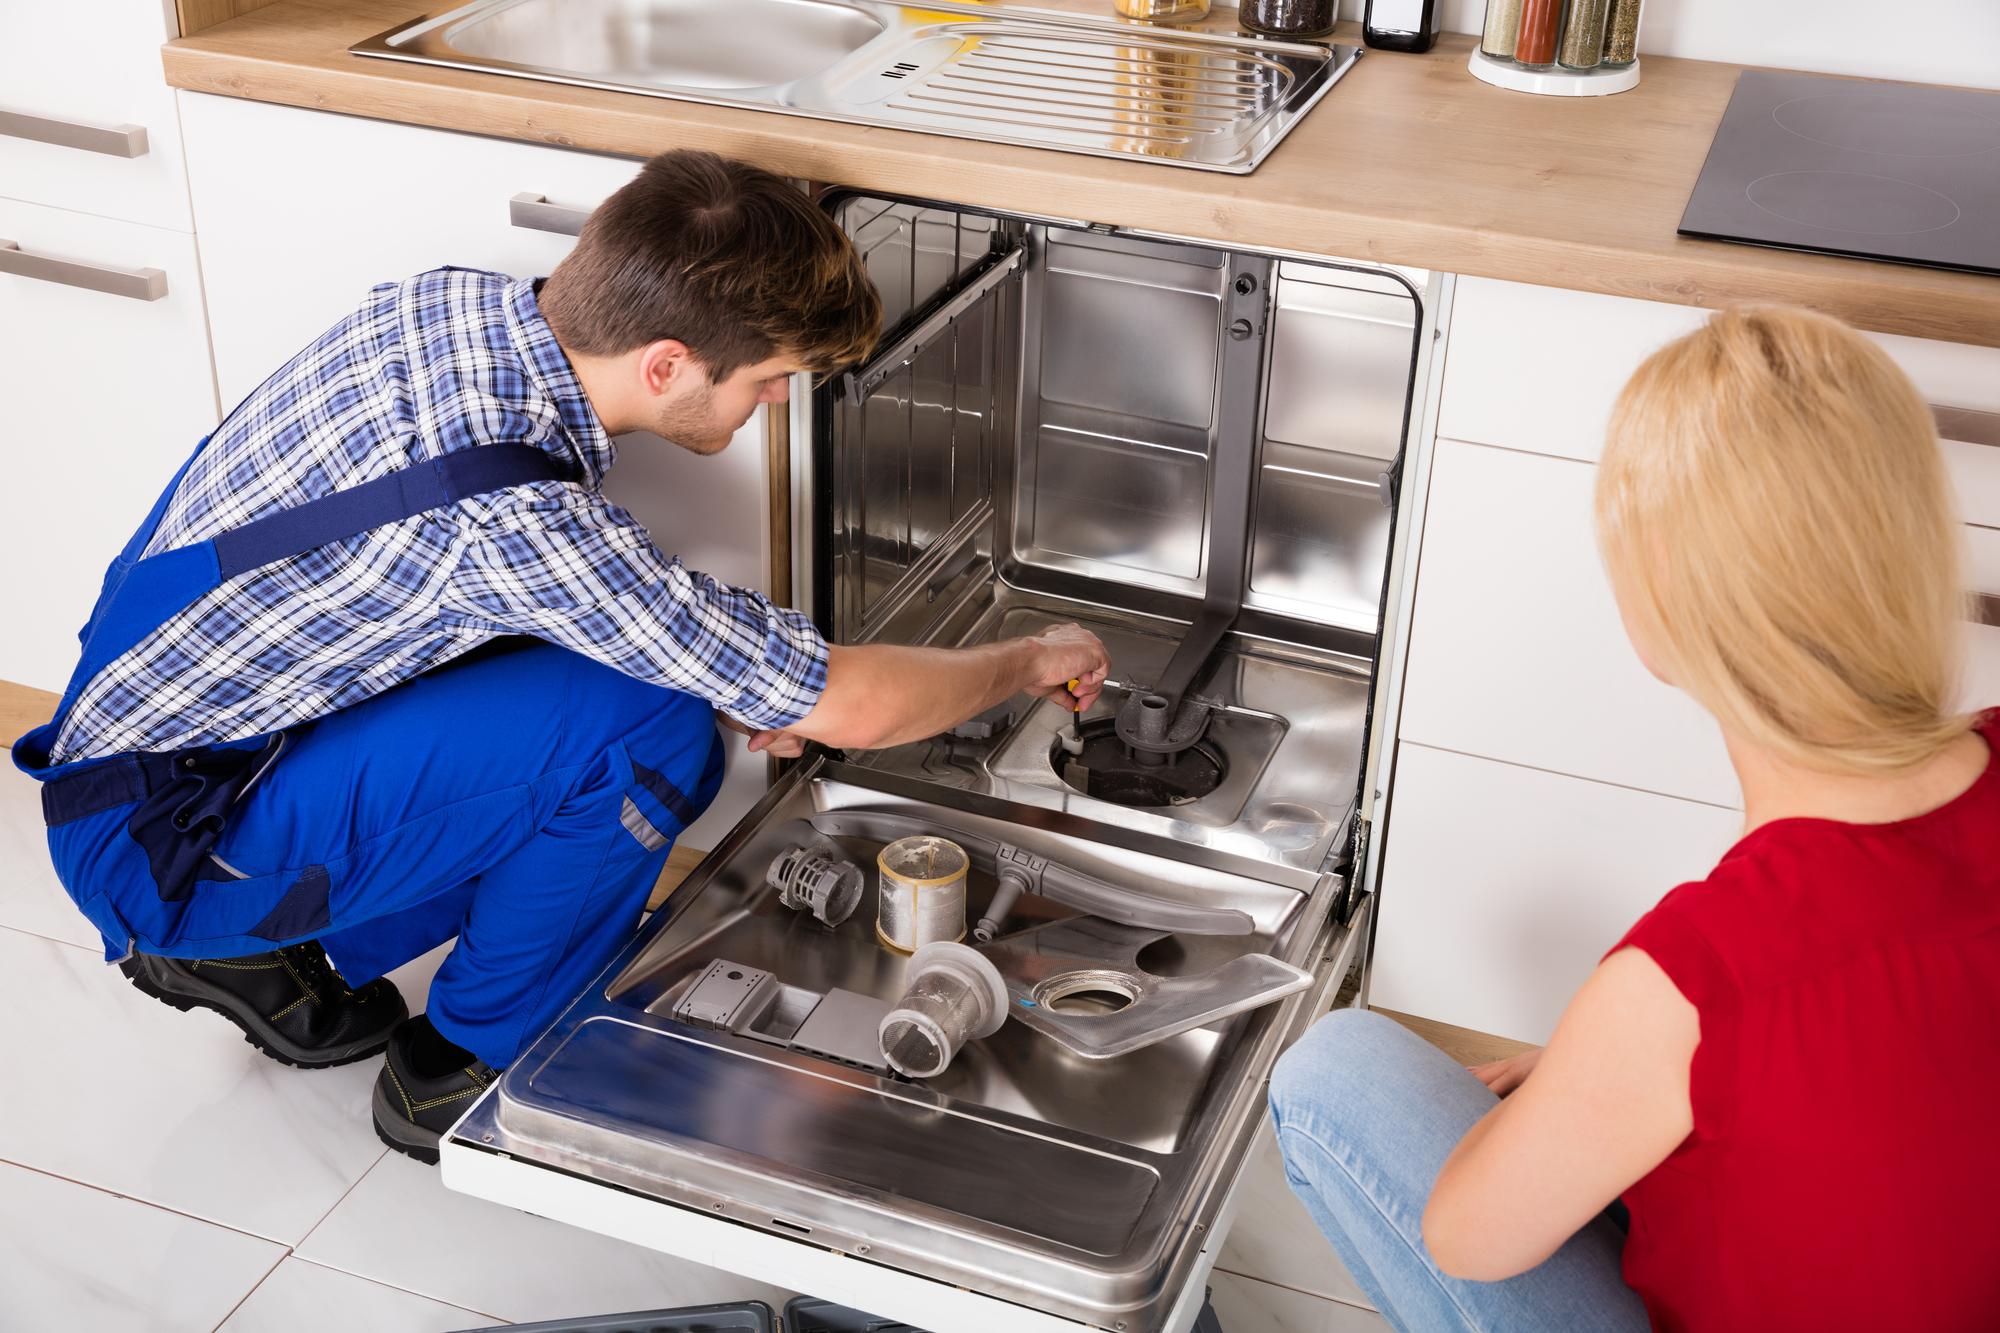 نمک ماشین ظرفشویی-نمک ظرفشویی-خرید نمک ظرفشویی